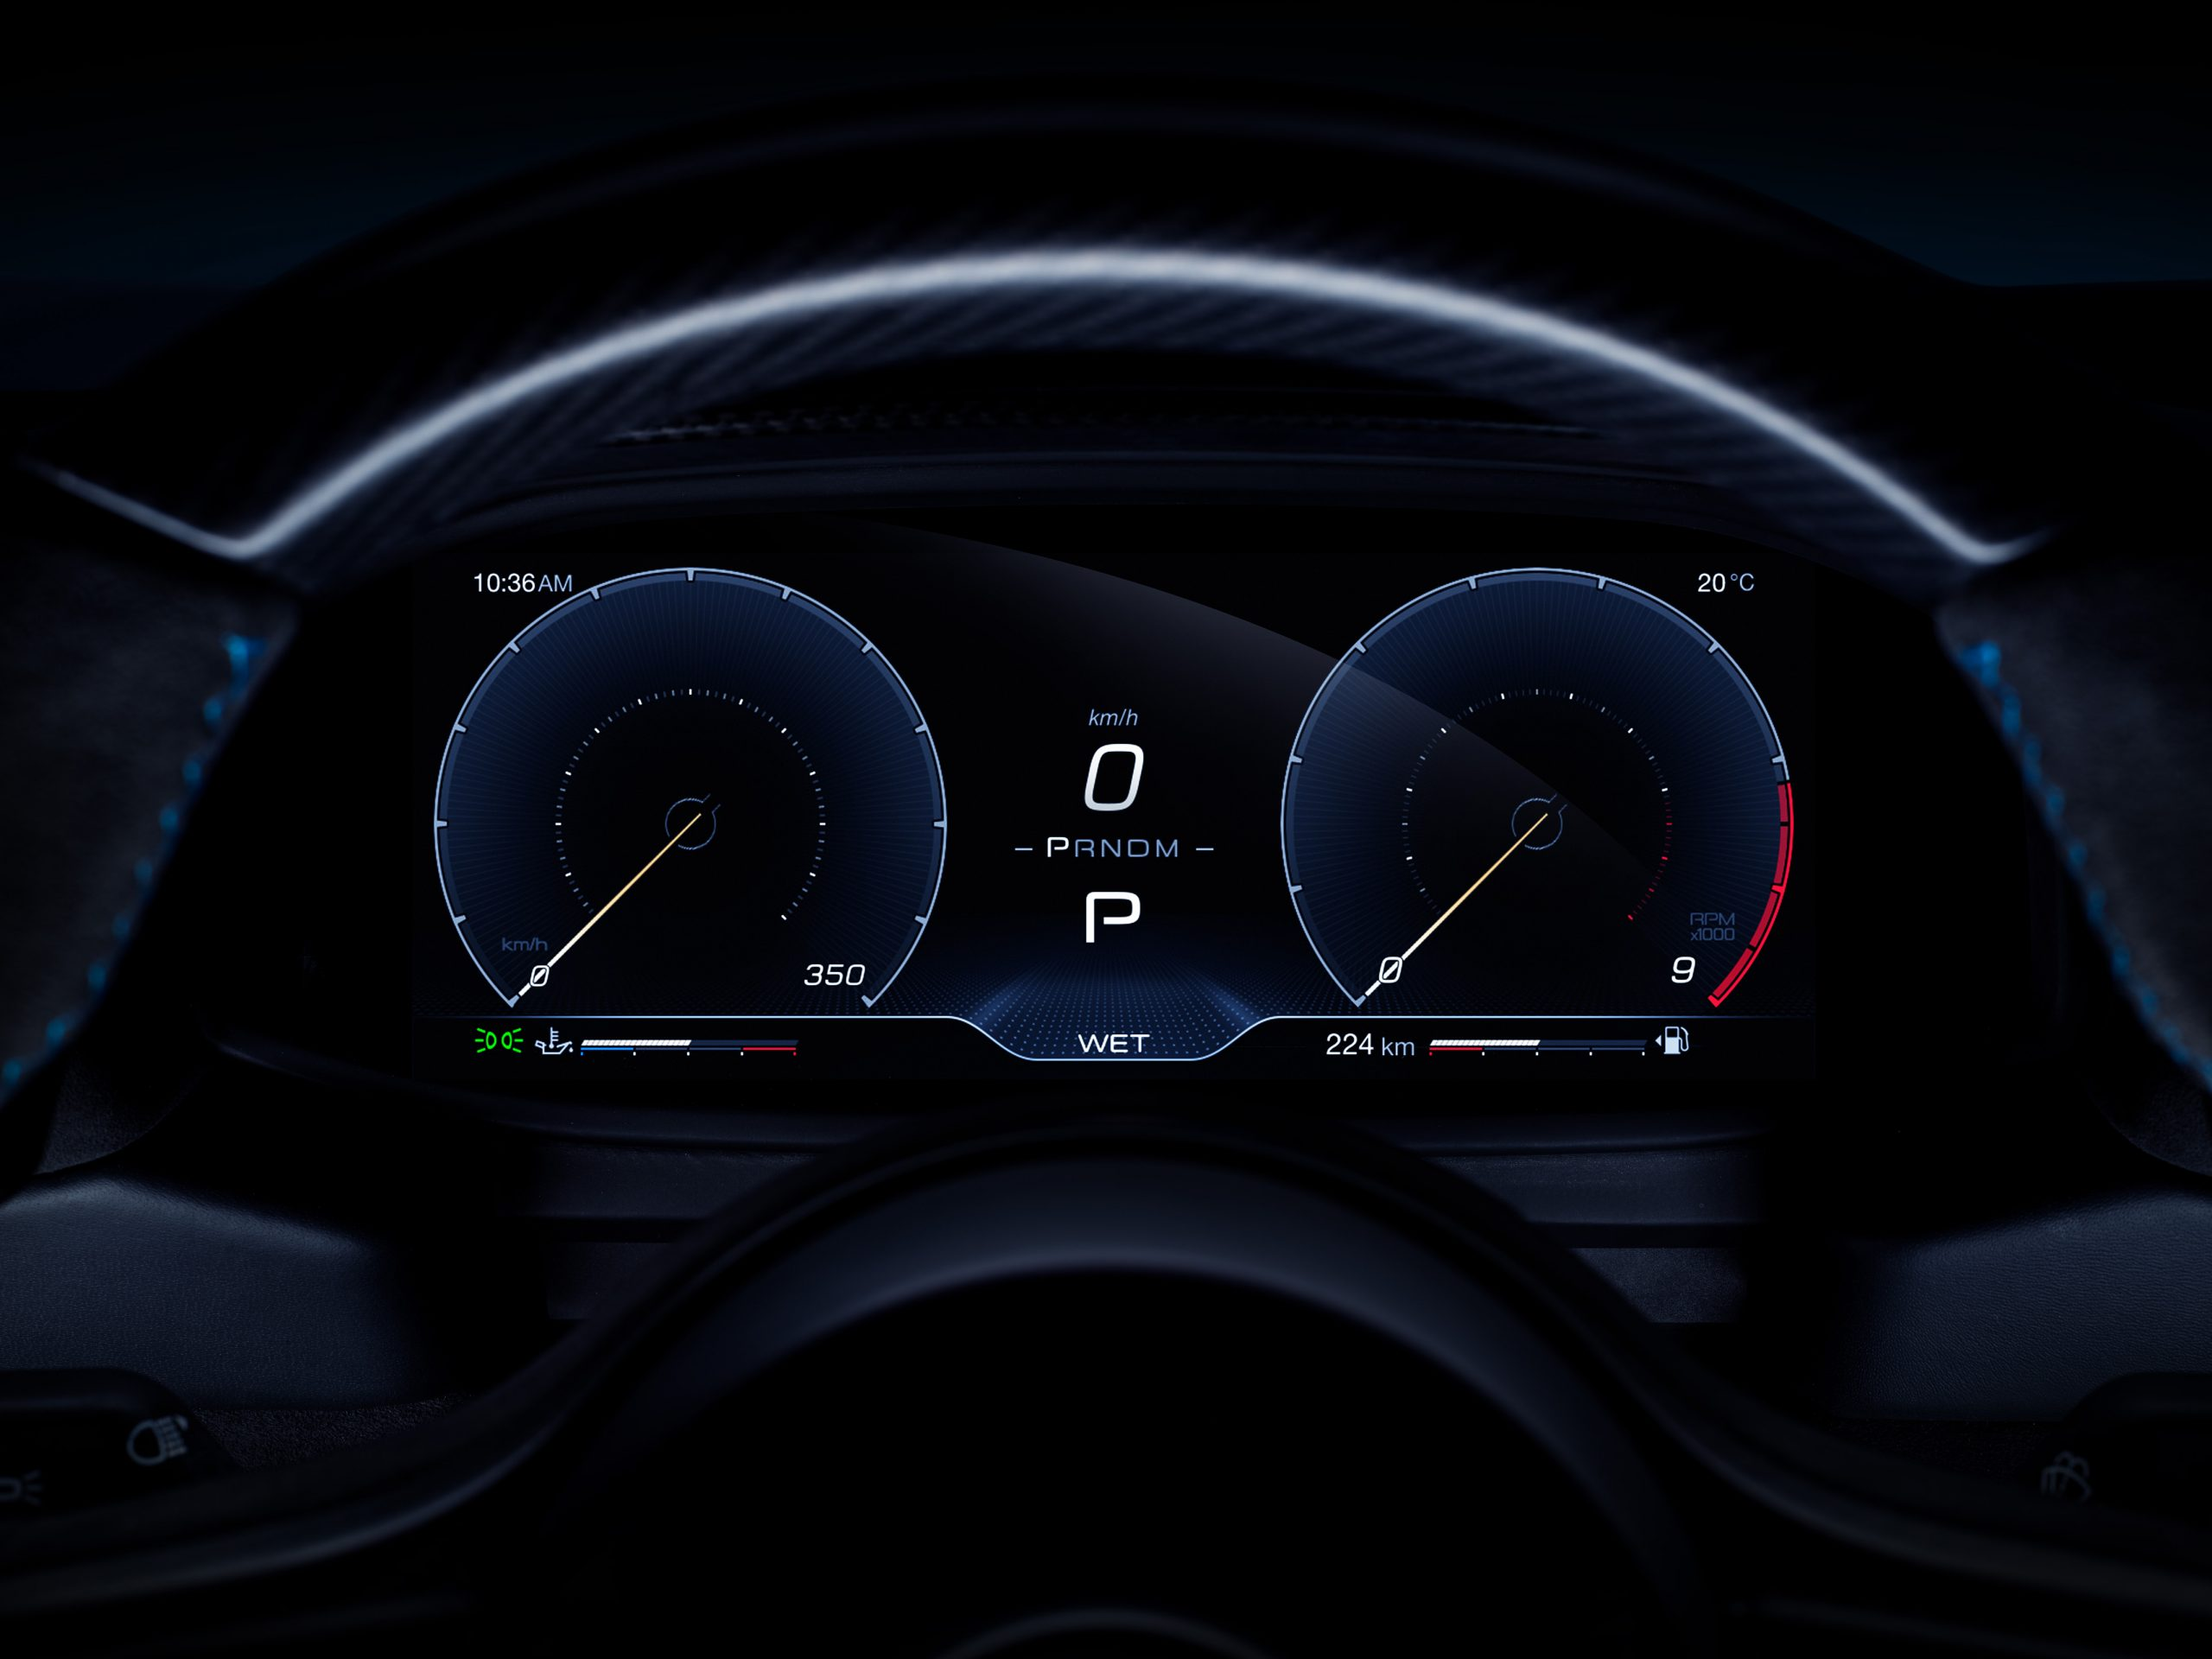 Maserati MC20 digital instrument panel